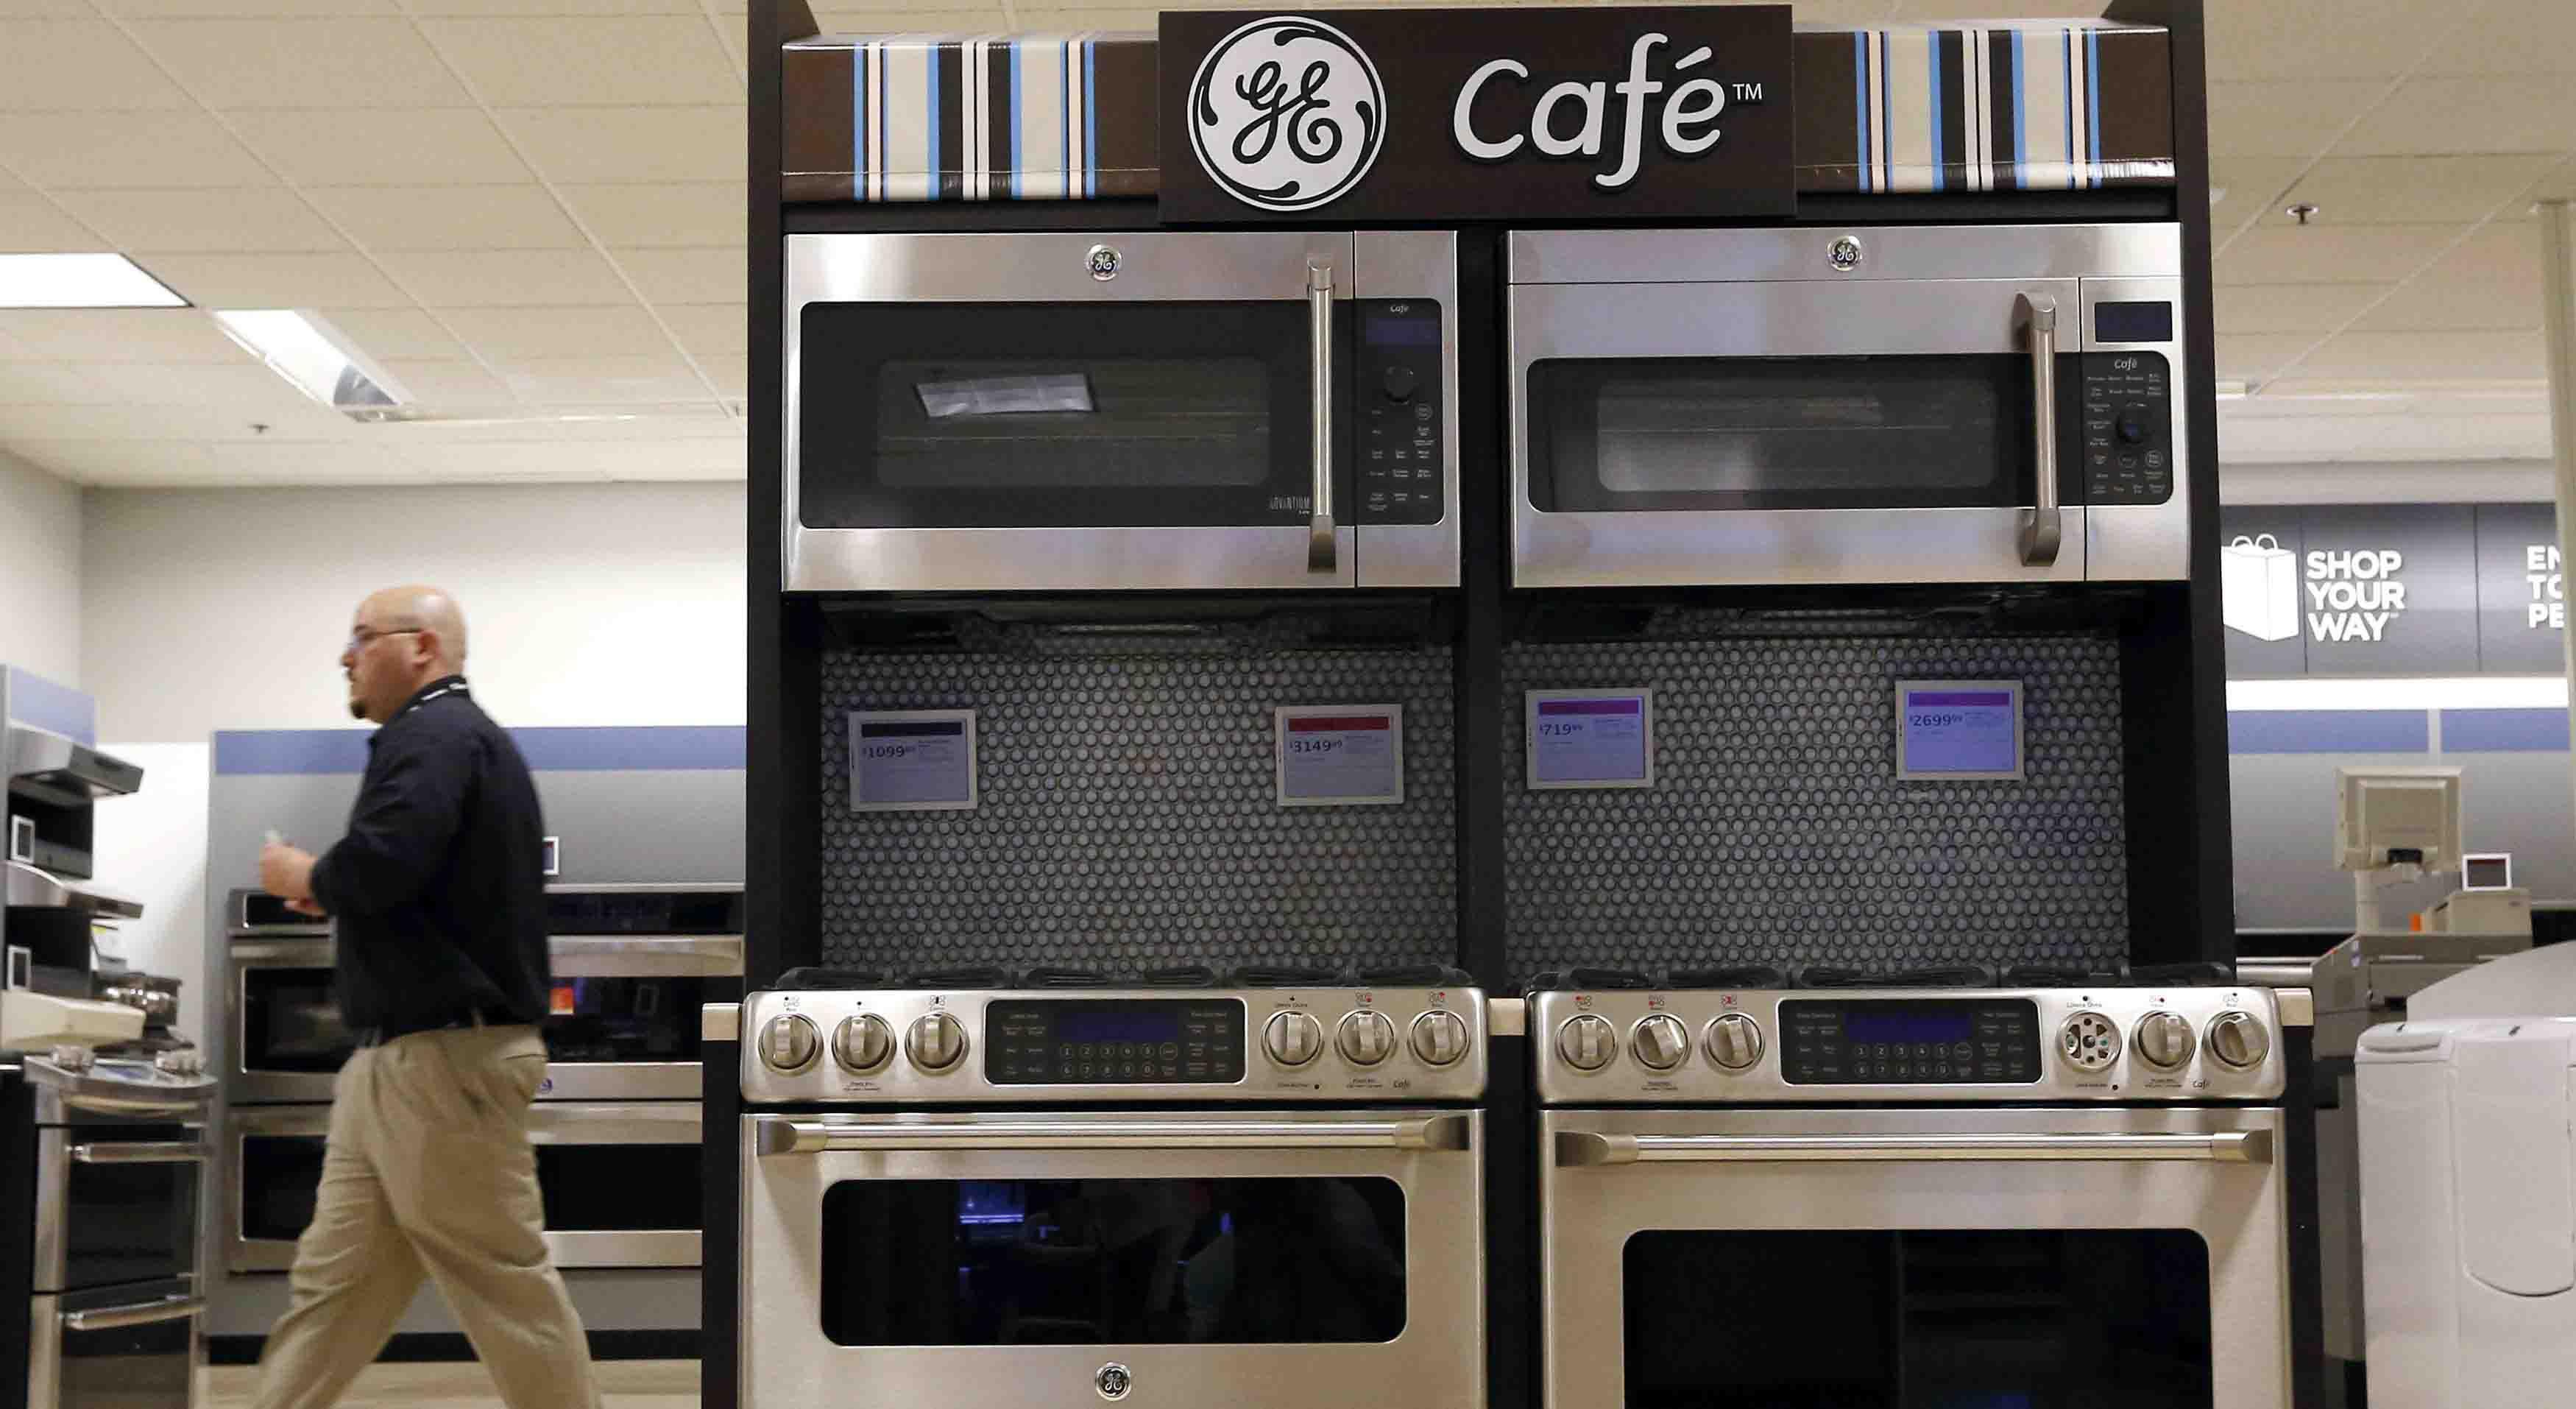 Sears evita la bancarrota y garantiza tiendas abiertas